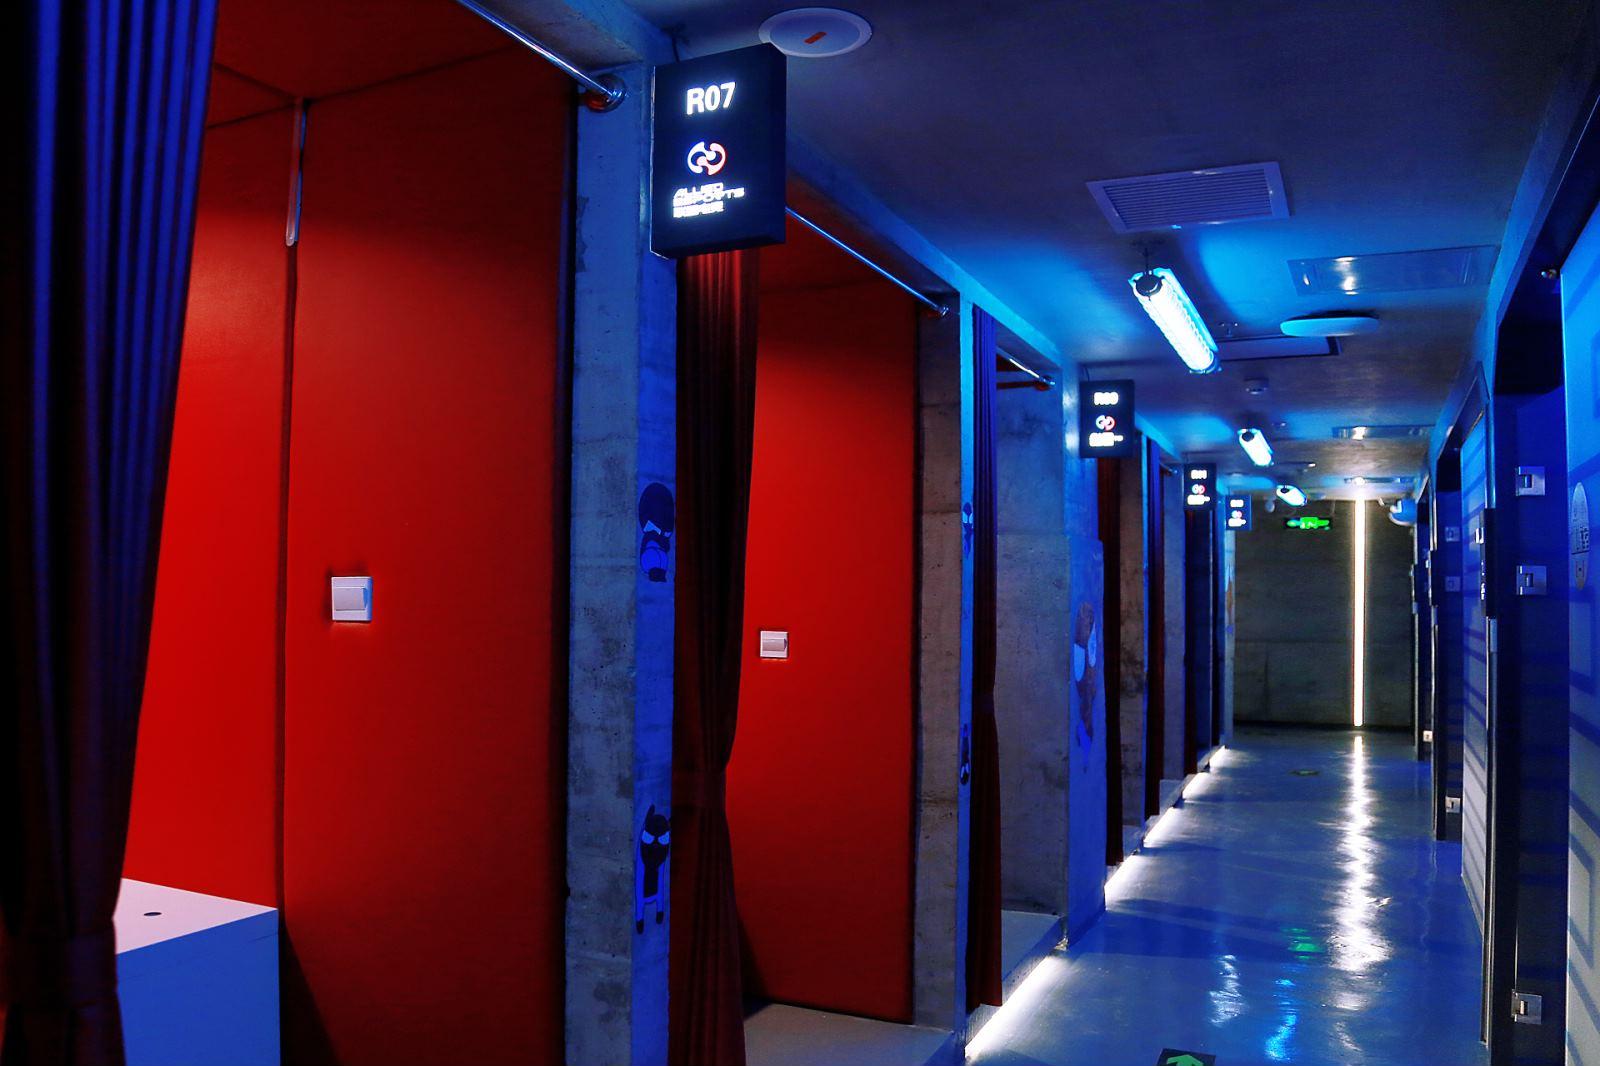 Computer Room Hallway.JPG